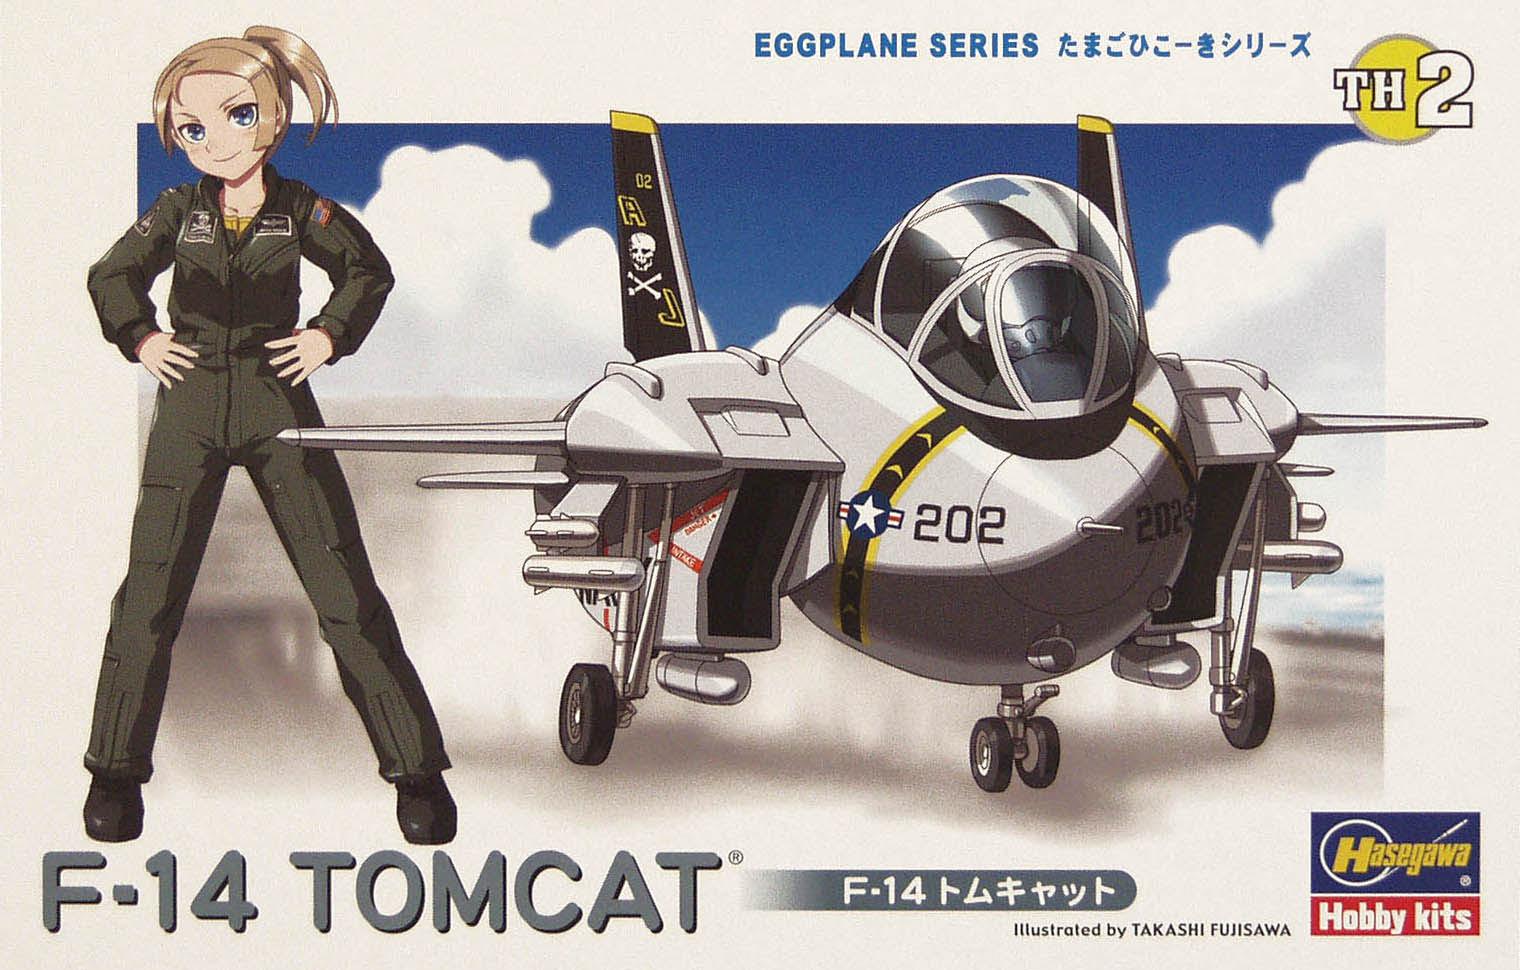 Hasegawa Egg Plane F-14 Tomcat TH2